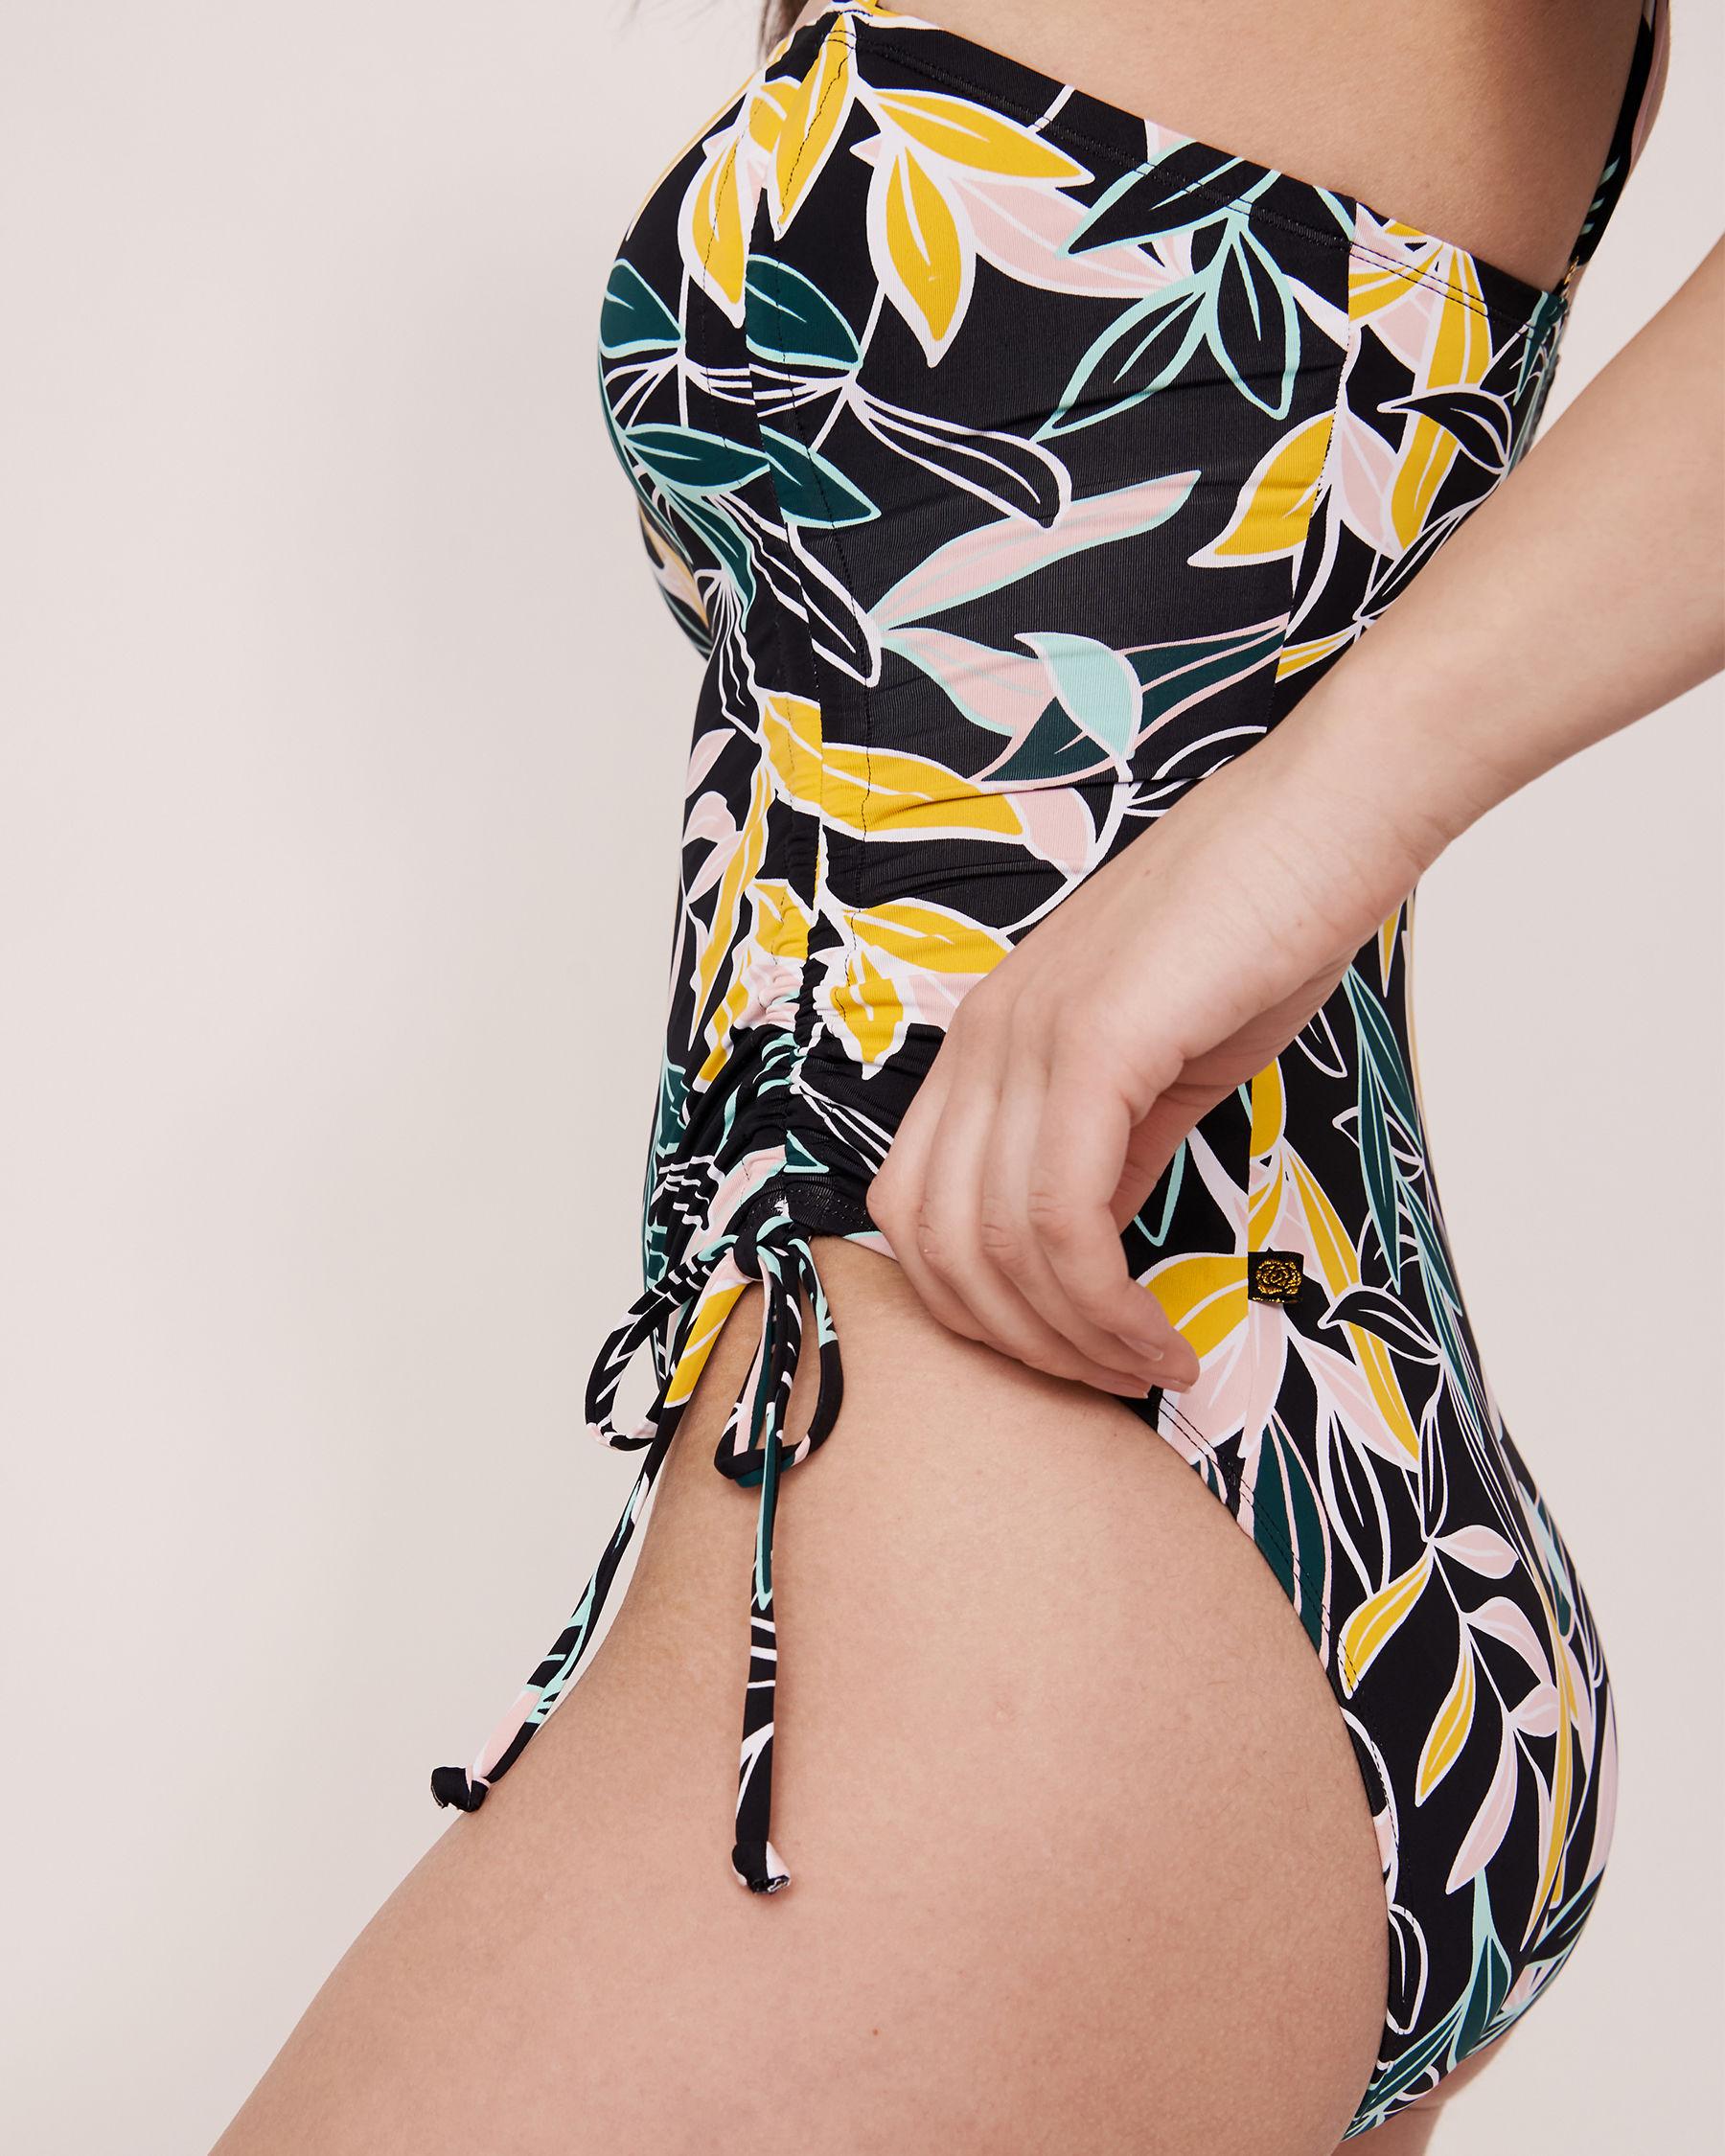 AQUAROSE JUNGLE RAVE Drawstring One-piece Swimsuit Jungle print 70400013 - View3